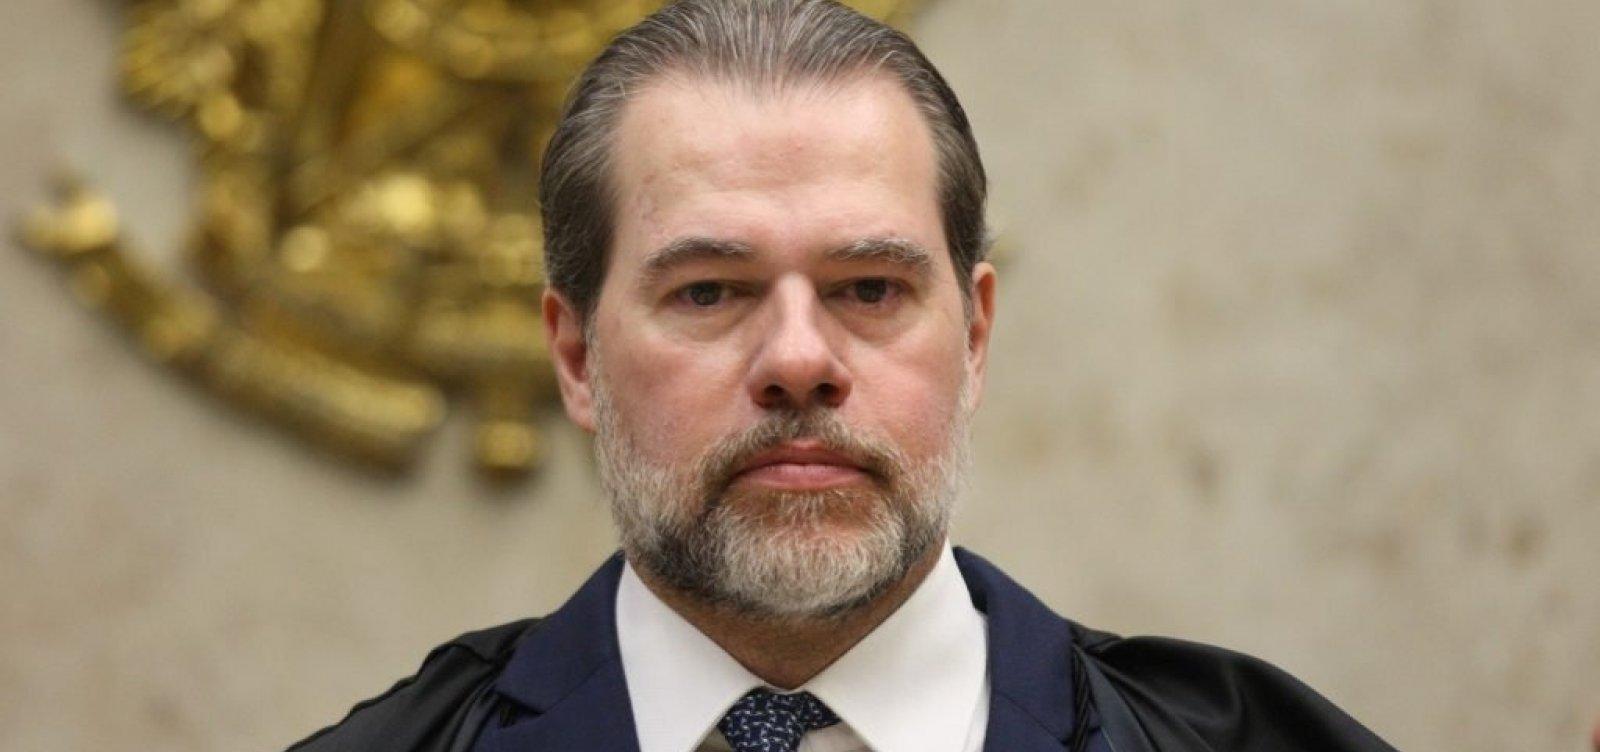 [Toffoli manda Alerj formar nova comissão para análise de impeachment de Witzel]